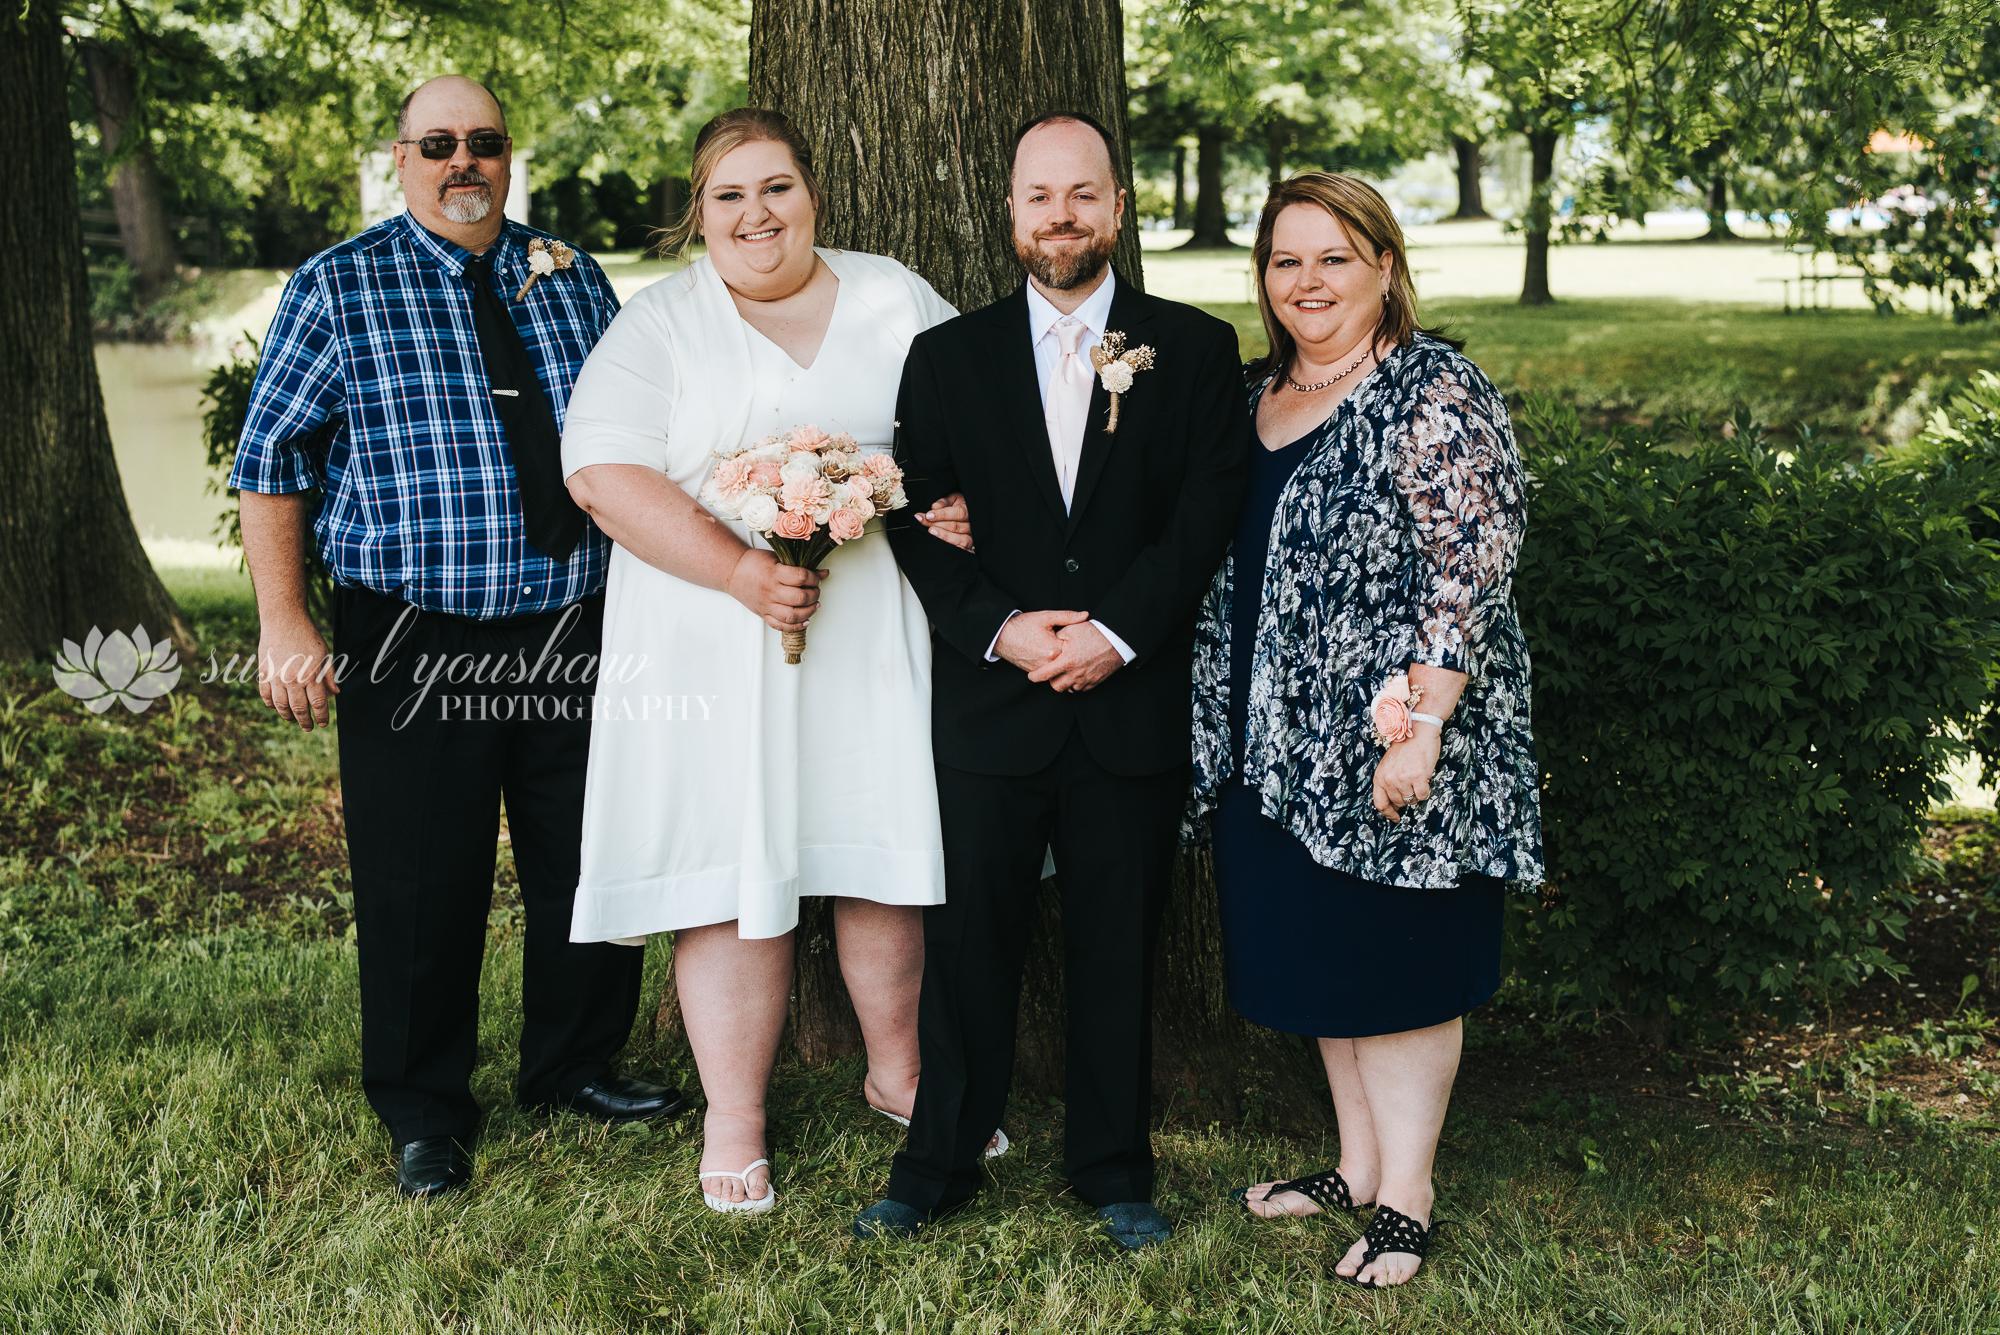 Bill and Sarah Wedding Photos 06-08-2019 SLY Photography -49.jpg